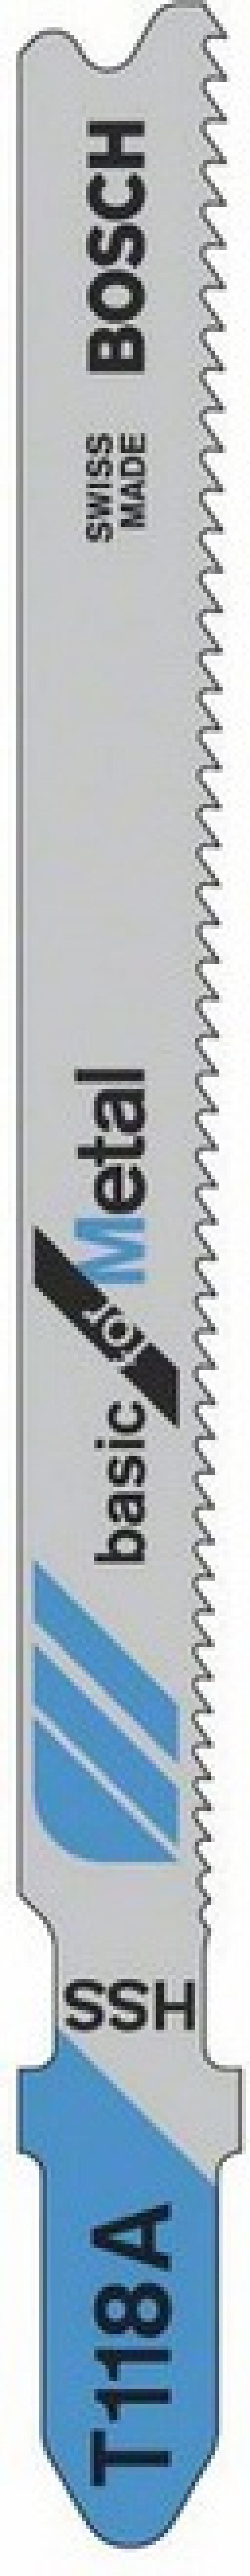 Лобзиковая пилка Bosch T 118 А HSS 5шт 2608631013 цена 2017